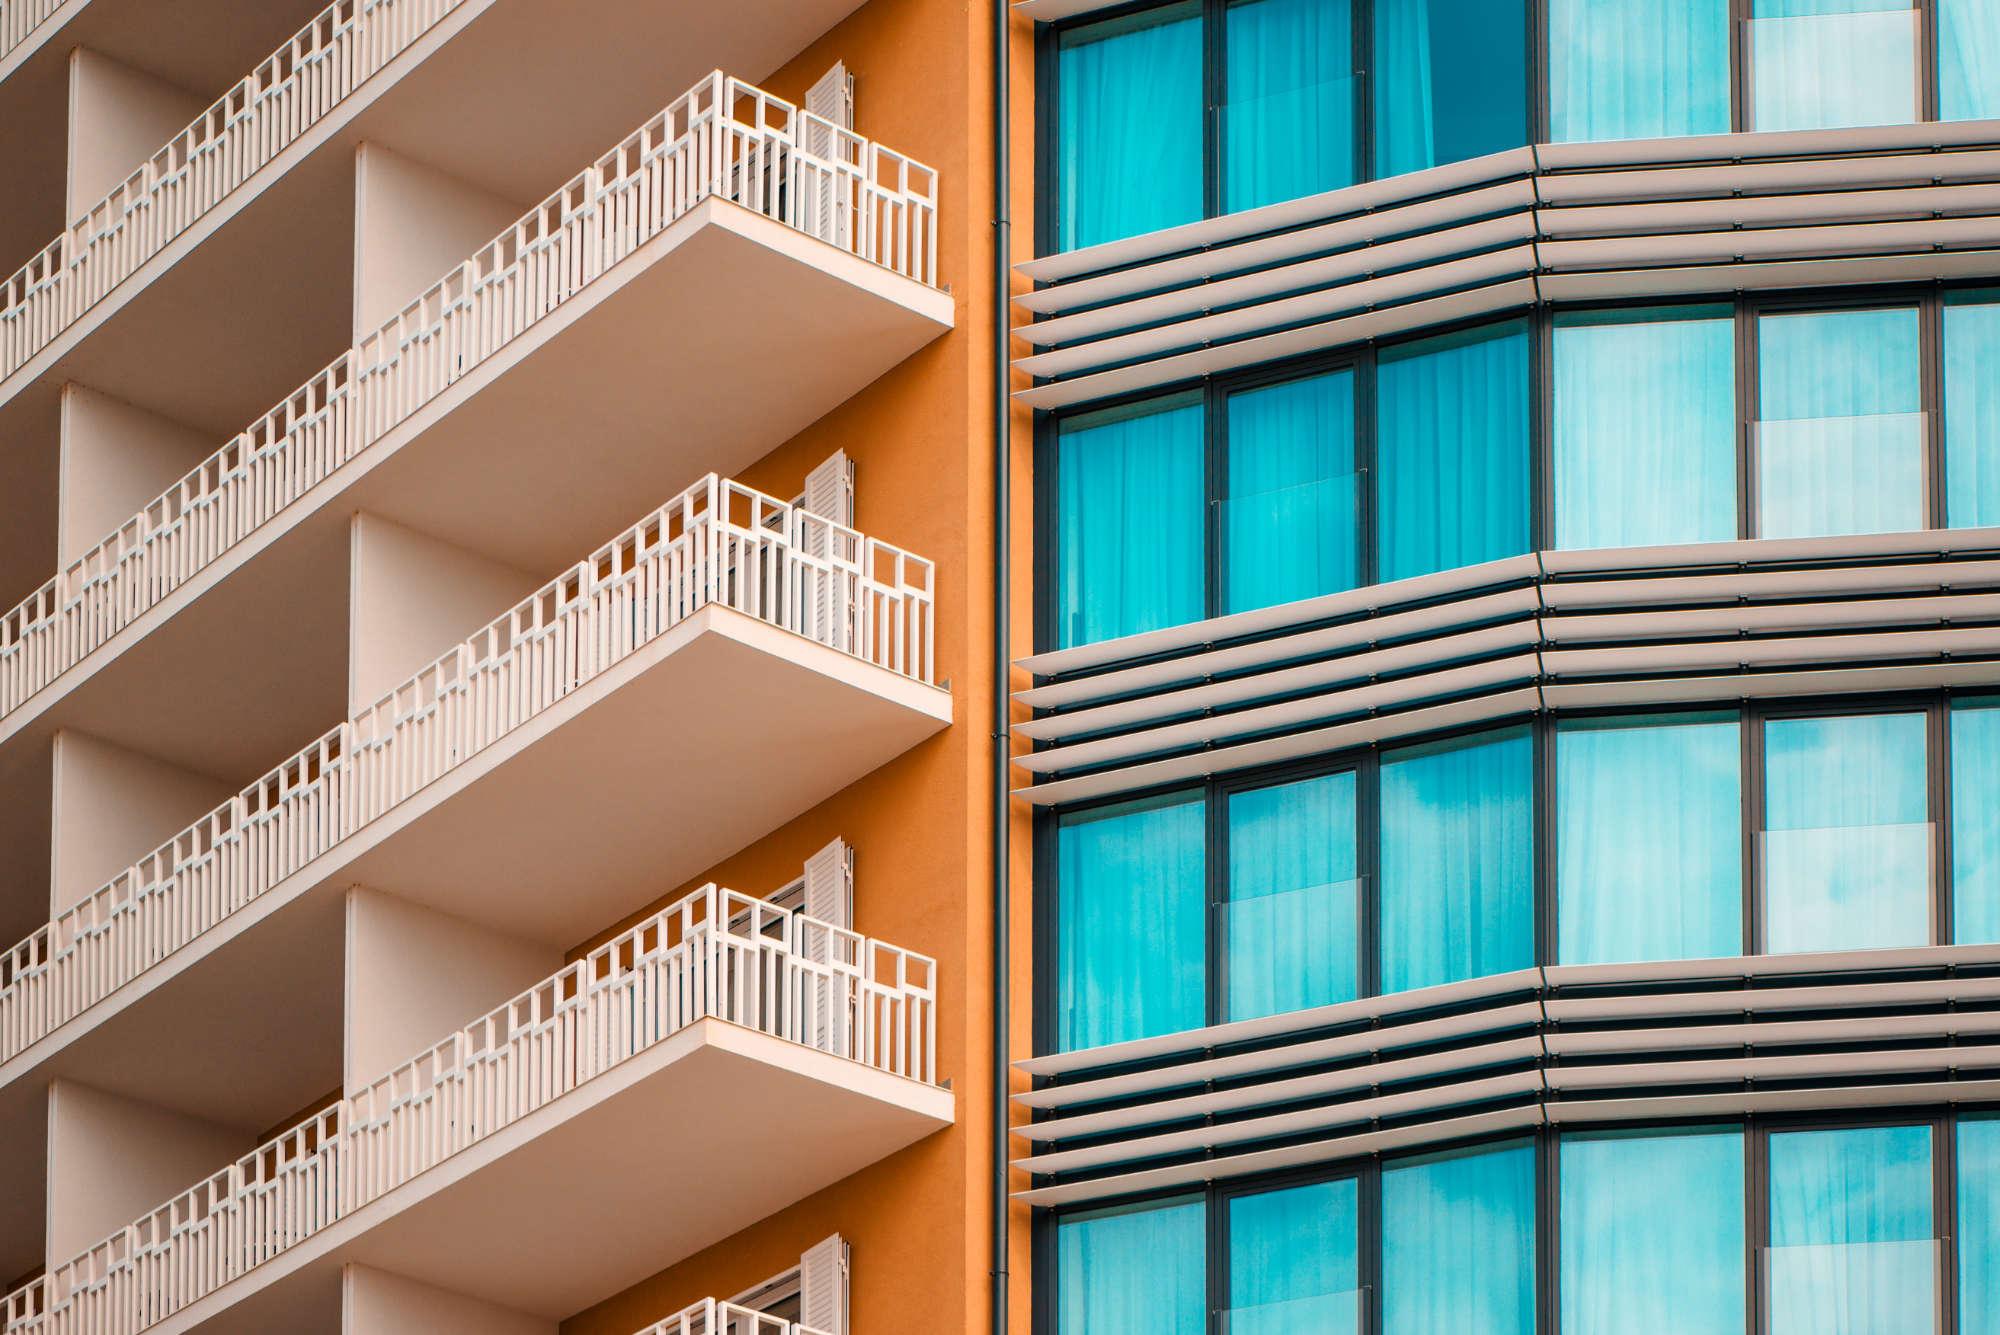 orange-and-teal-modern-building-facade-PH2QZAU.jpg